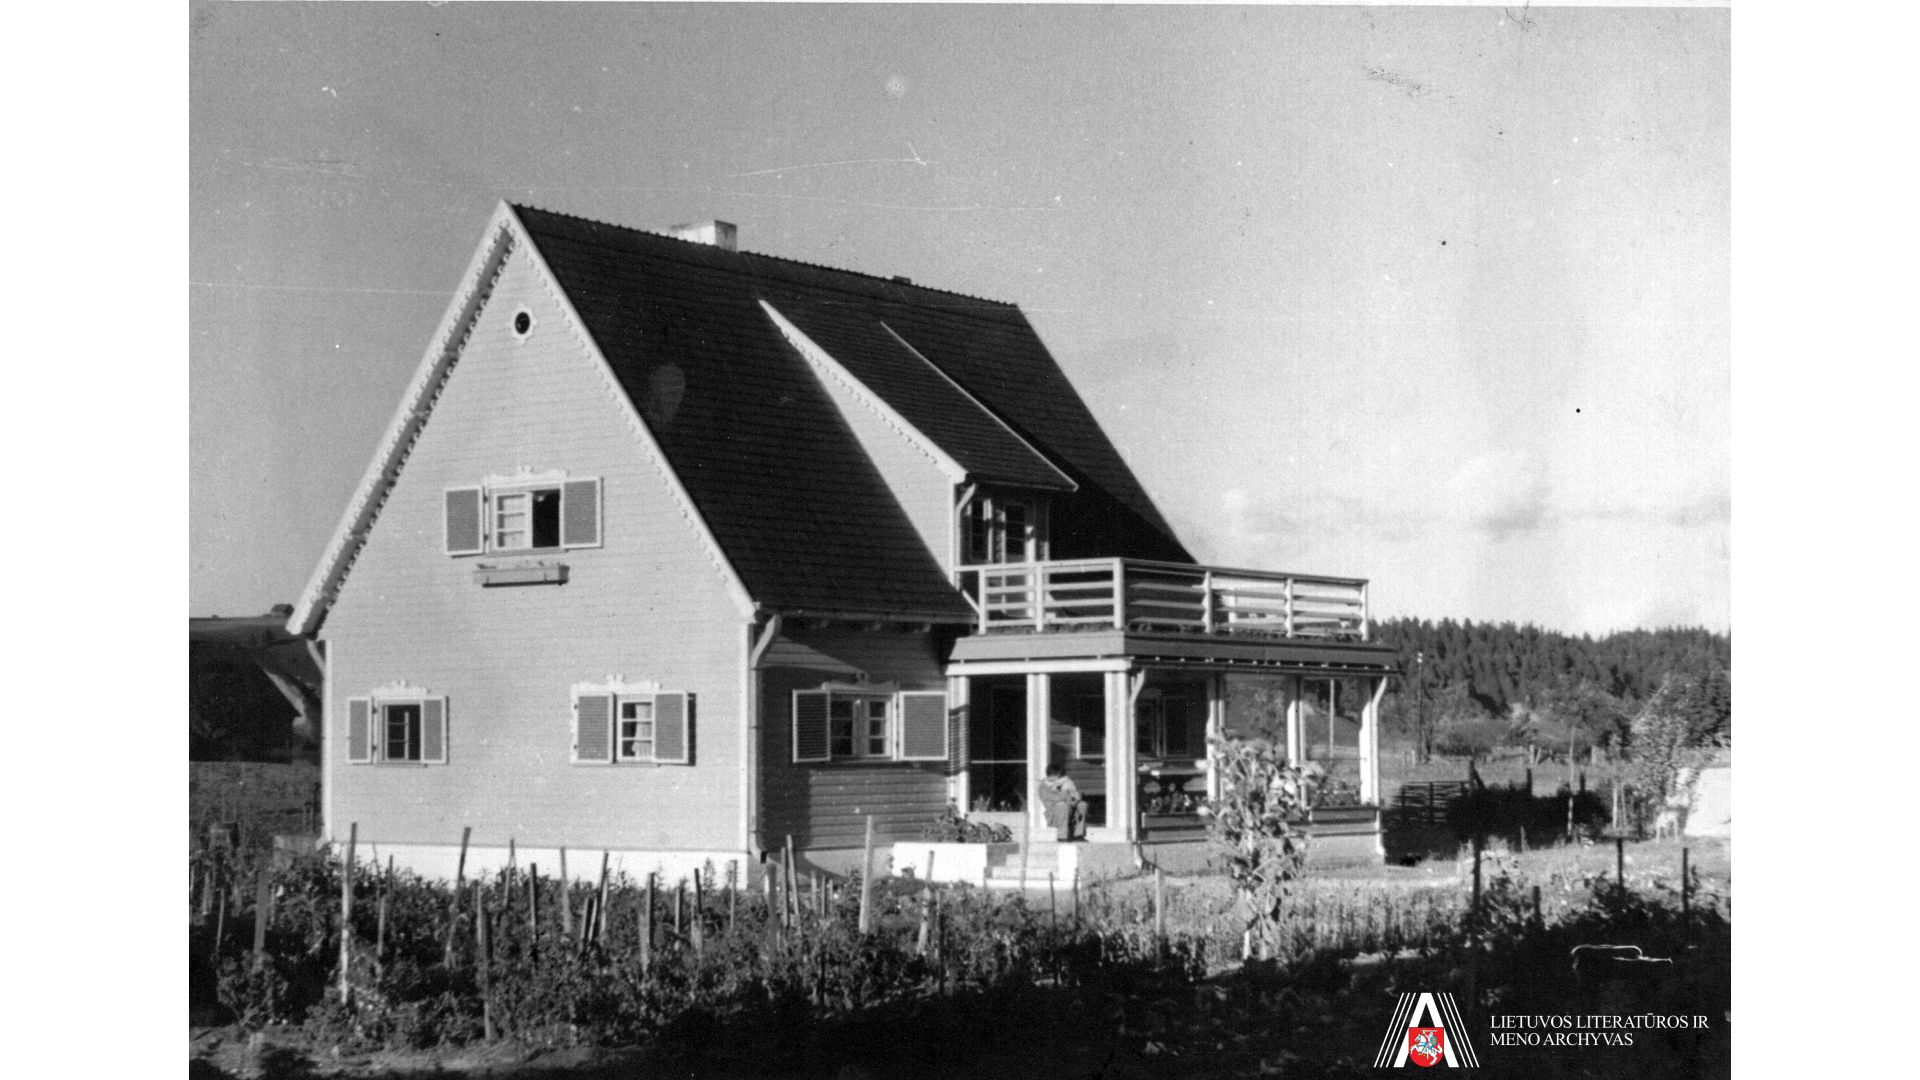 landsbergiu vila istorine